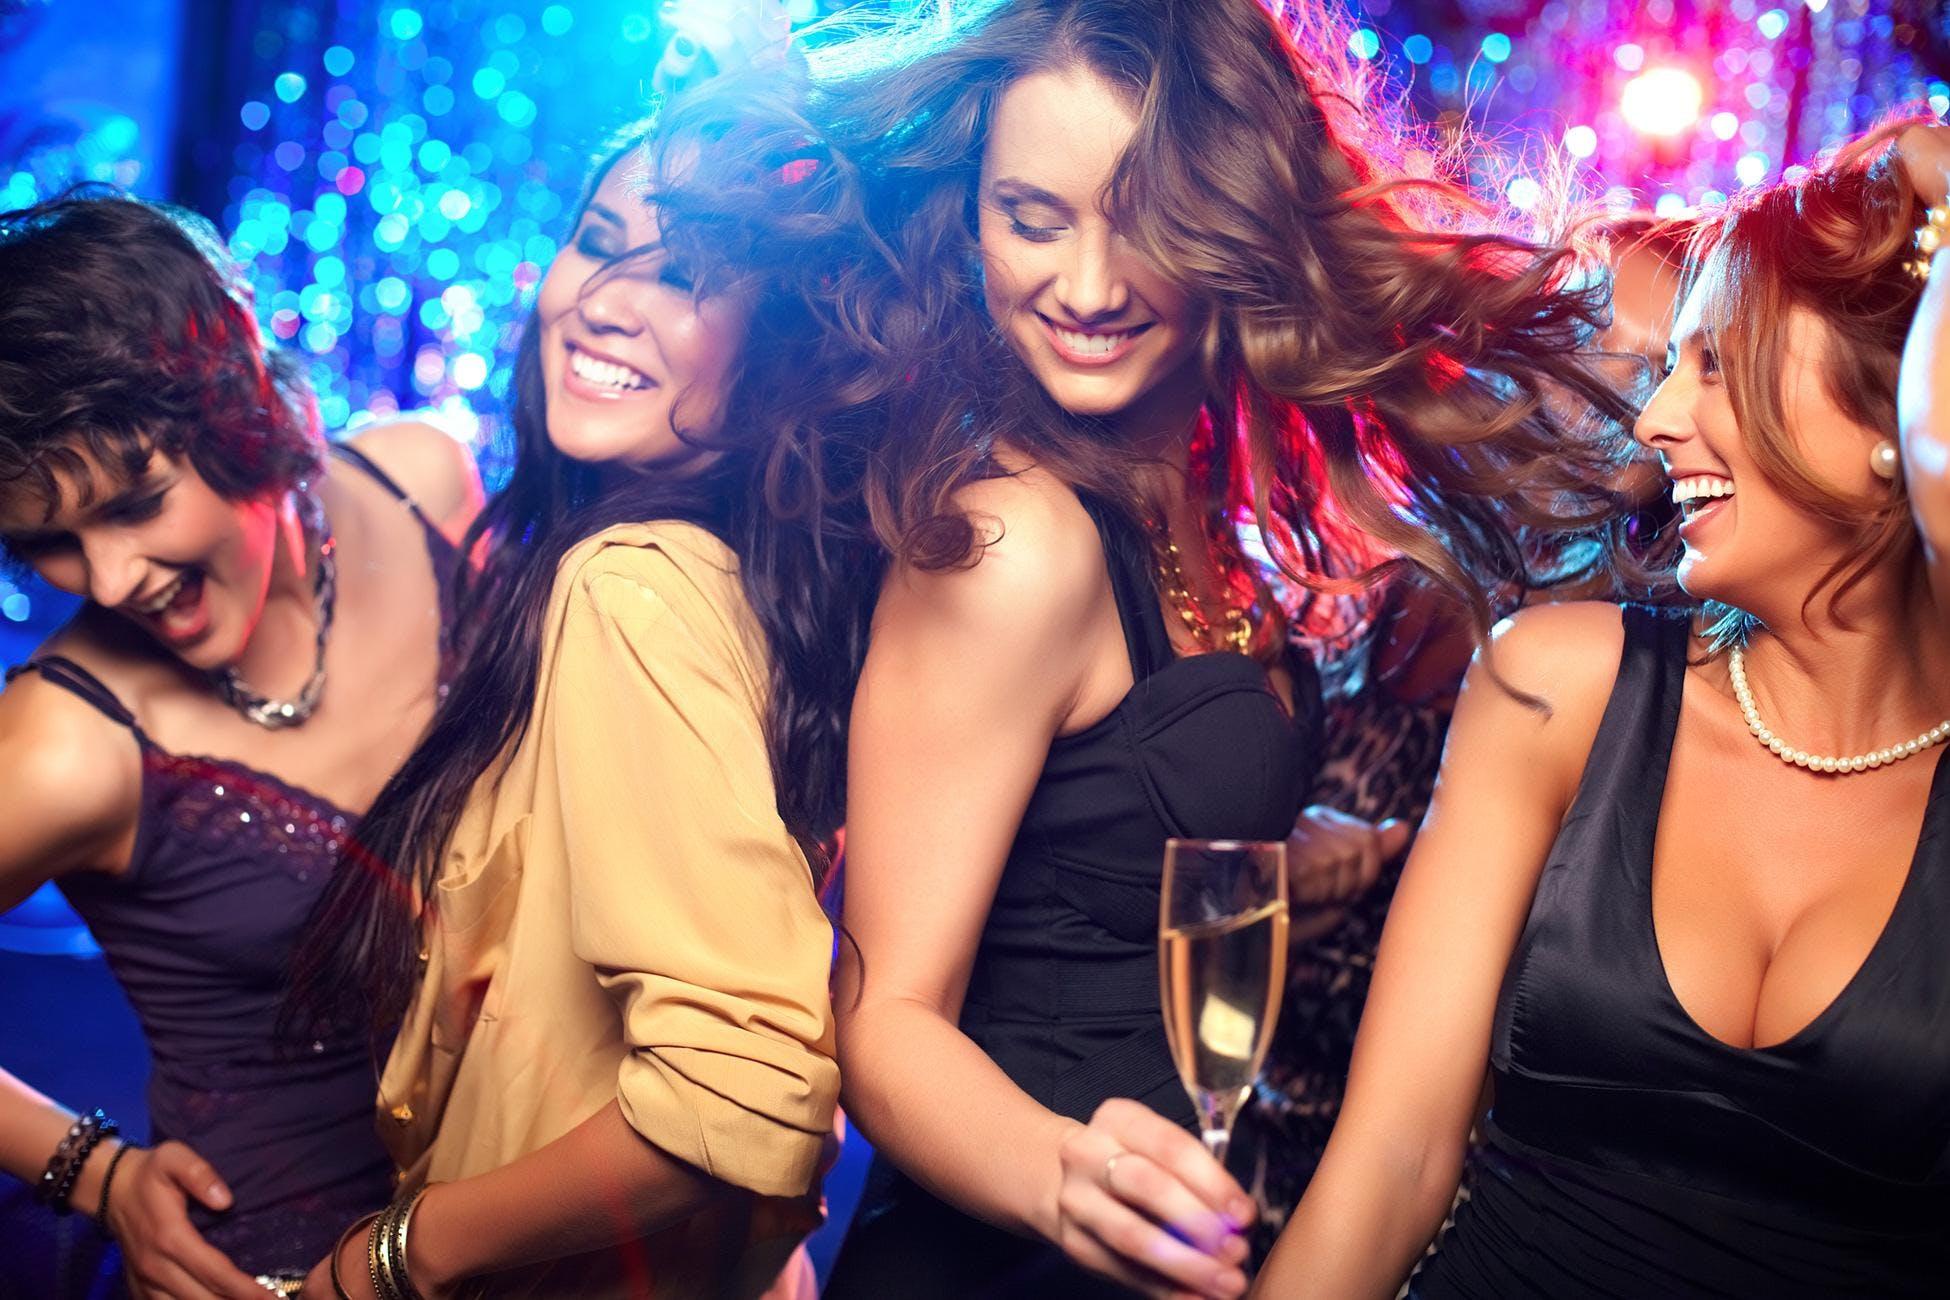 AMBIENTE LATINO SATURDAY NIGHT PARTY AT LA TERRAZA  Times Square, Views & Vibes